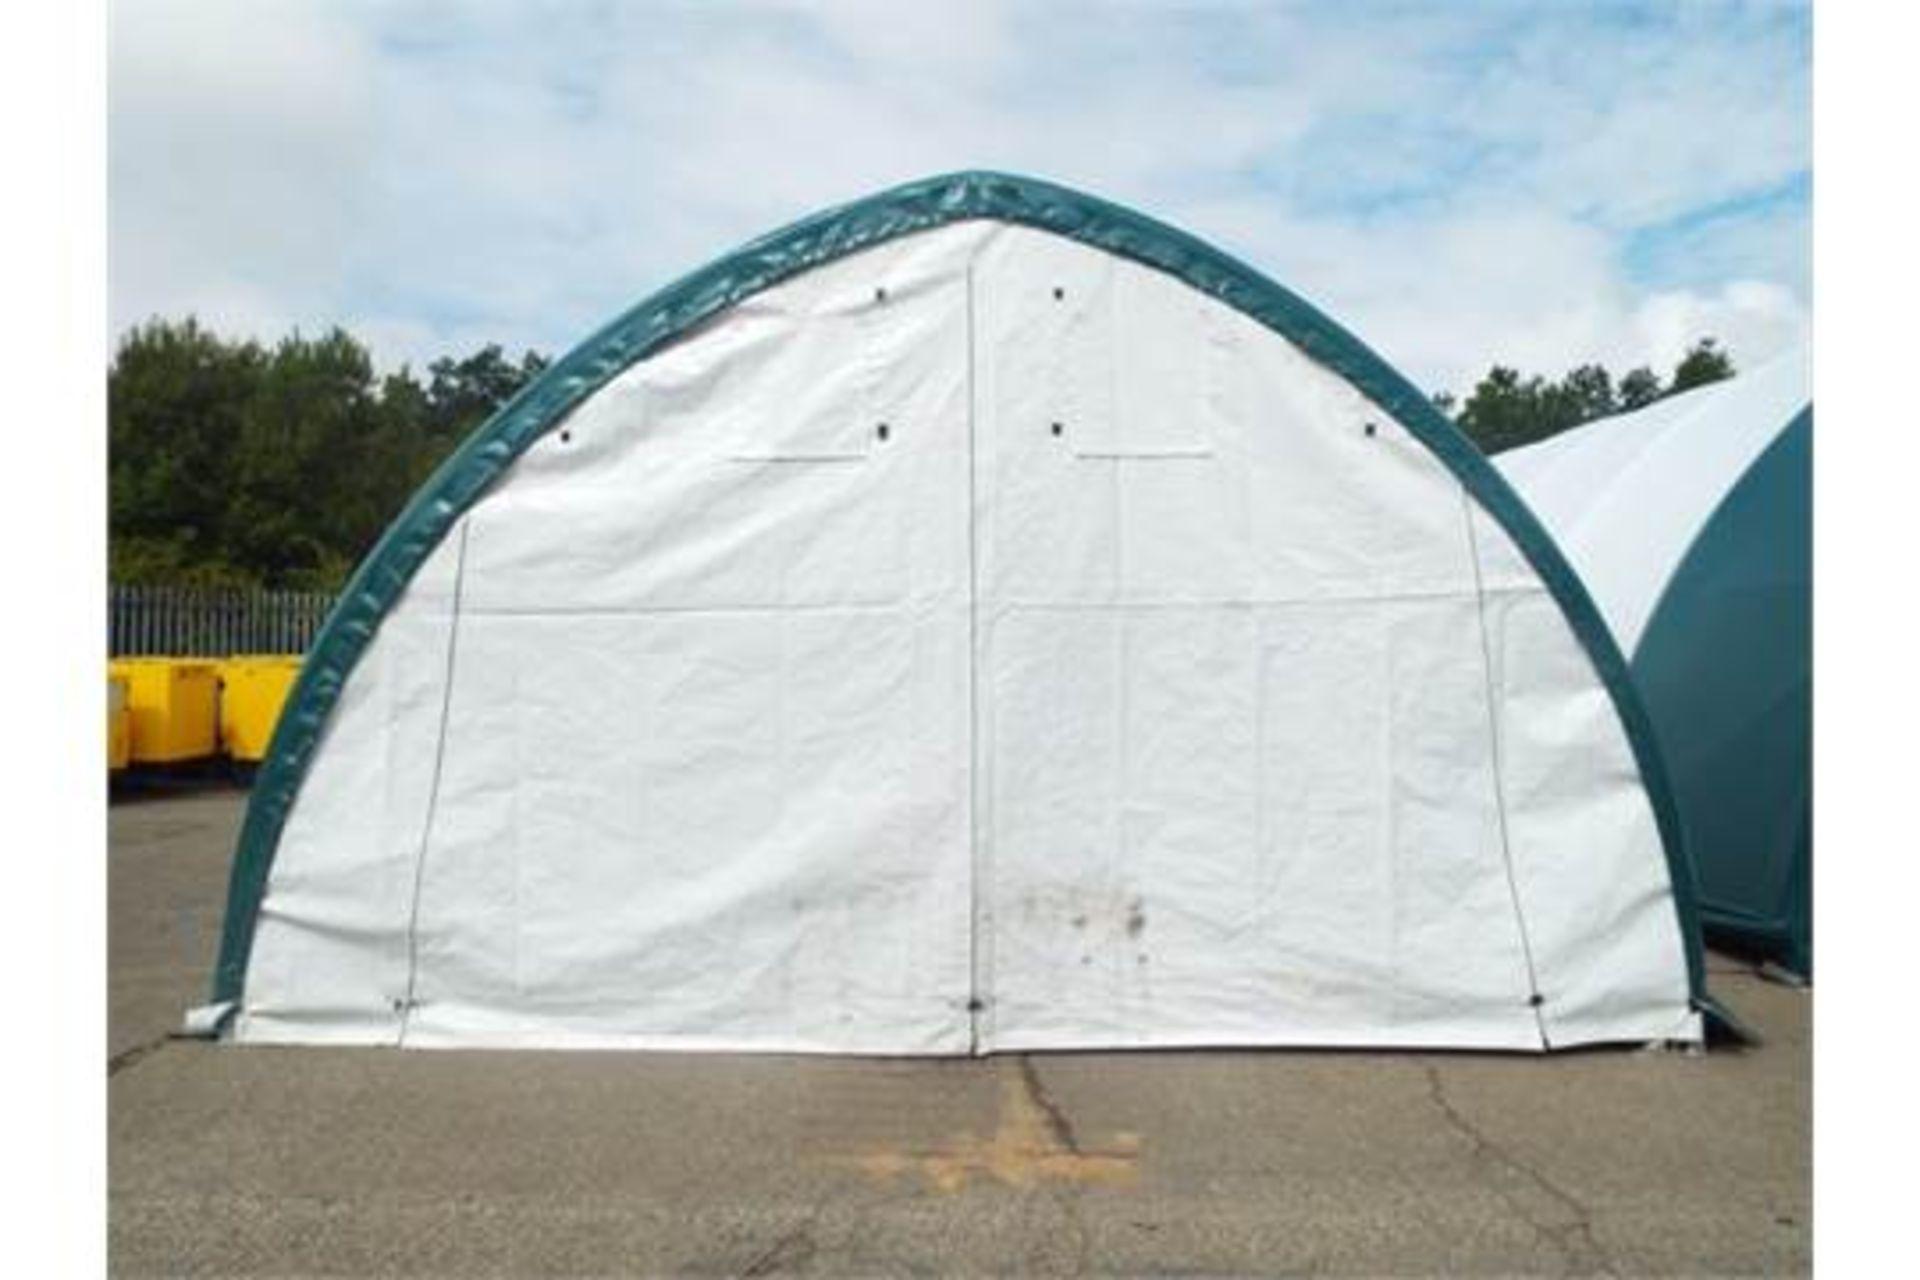 Lot 4 - Heavy Duty Peak Storage Shelter 20'W x 30'L x 12' H P/No 203012QX-8P